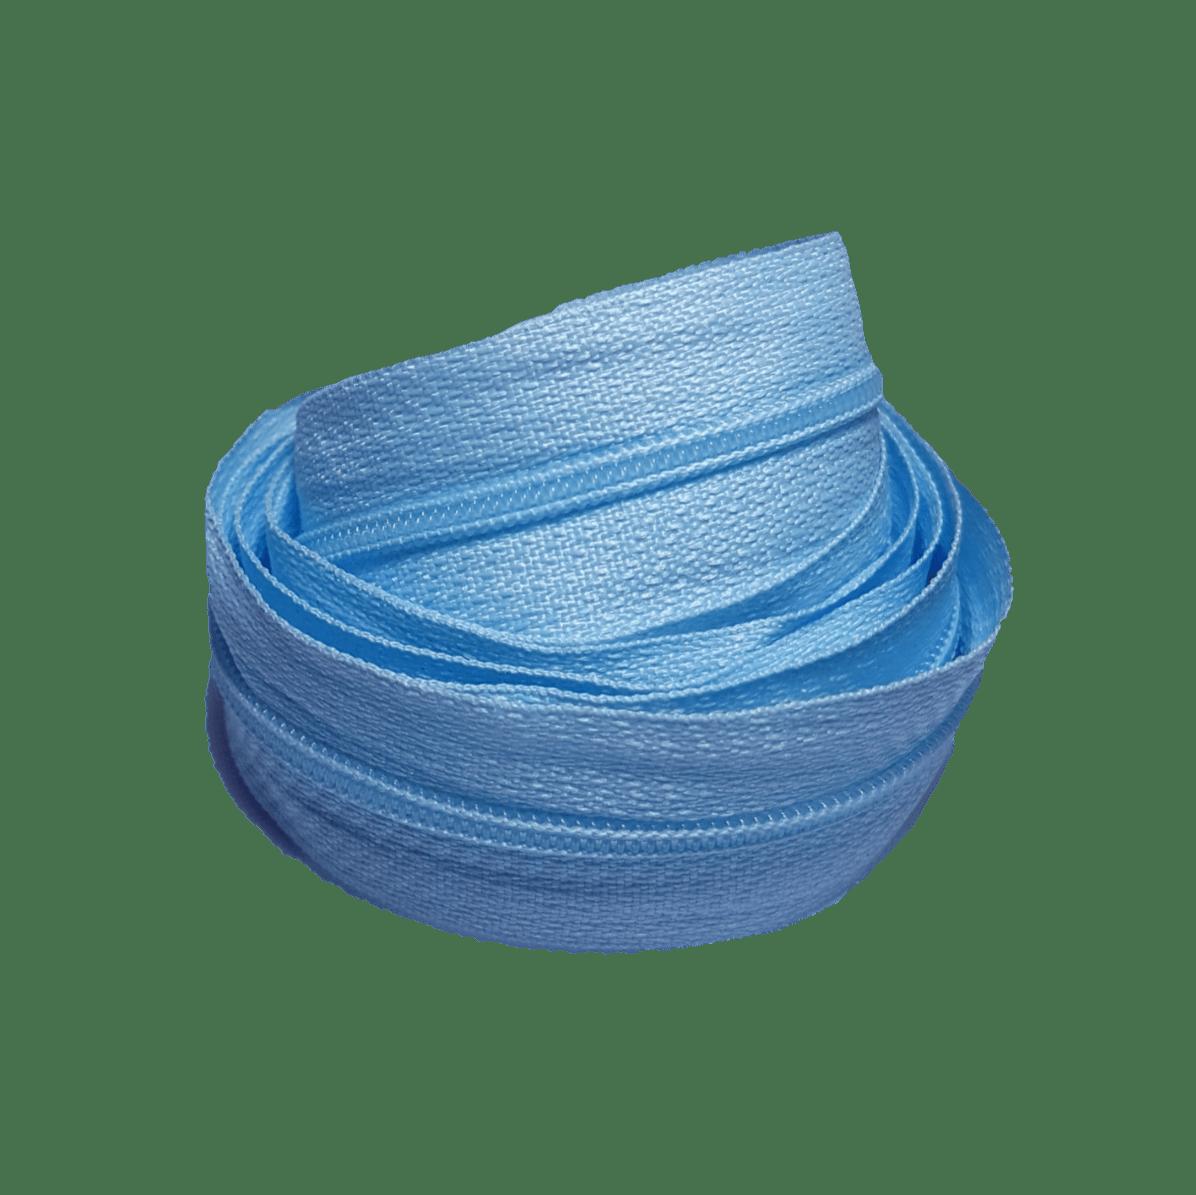 Zíper por metro nº 3 - Azul Claro